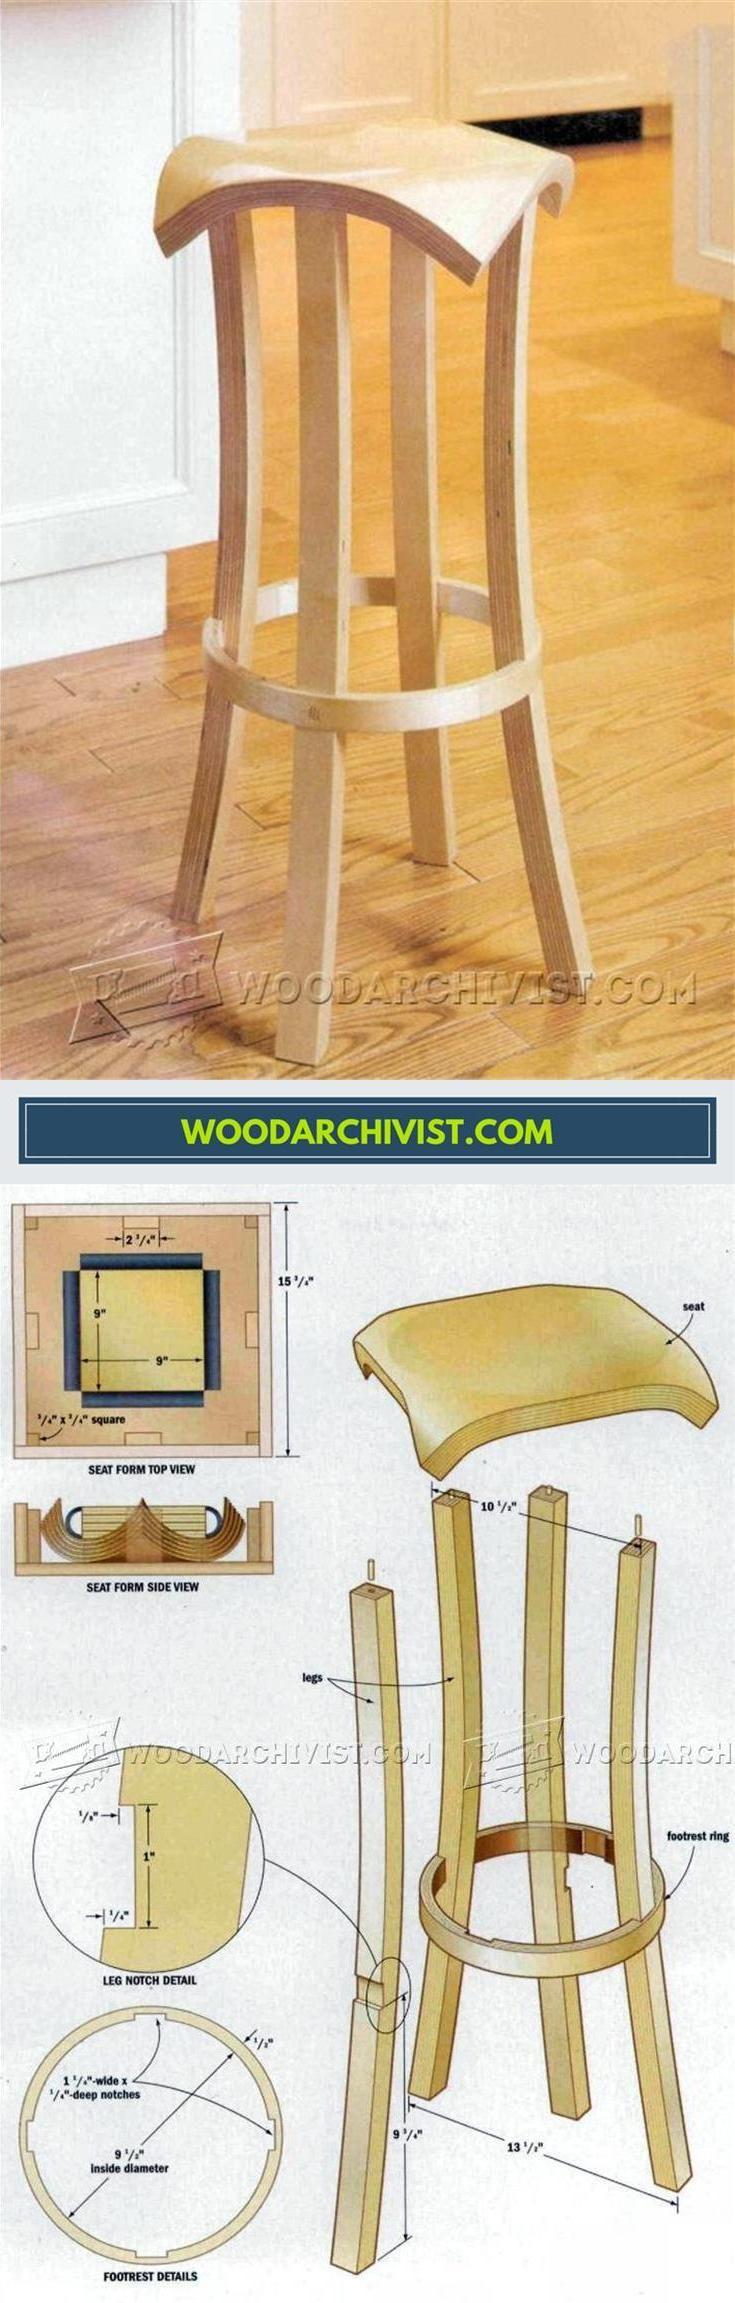 DIY Bar Stools - Furniture Plans and Projects | WoodArchivist.com